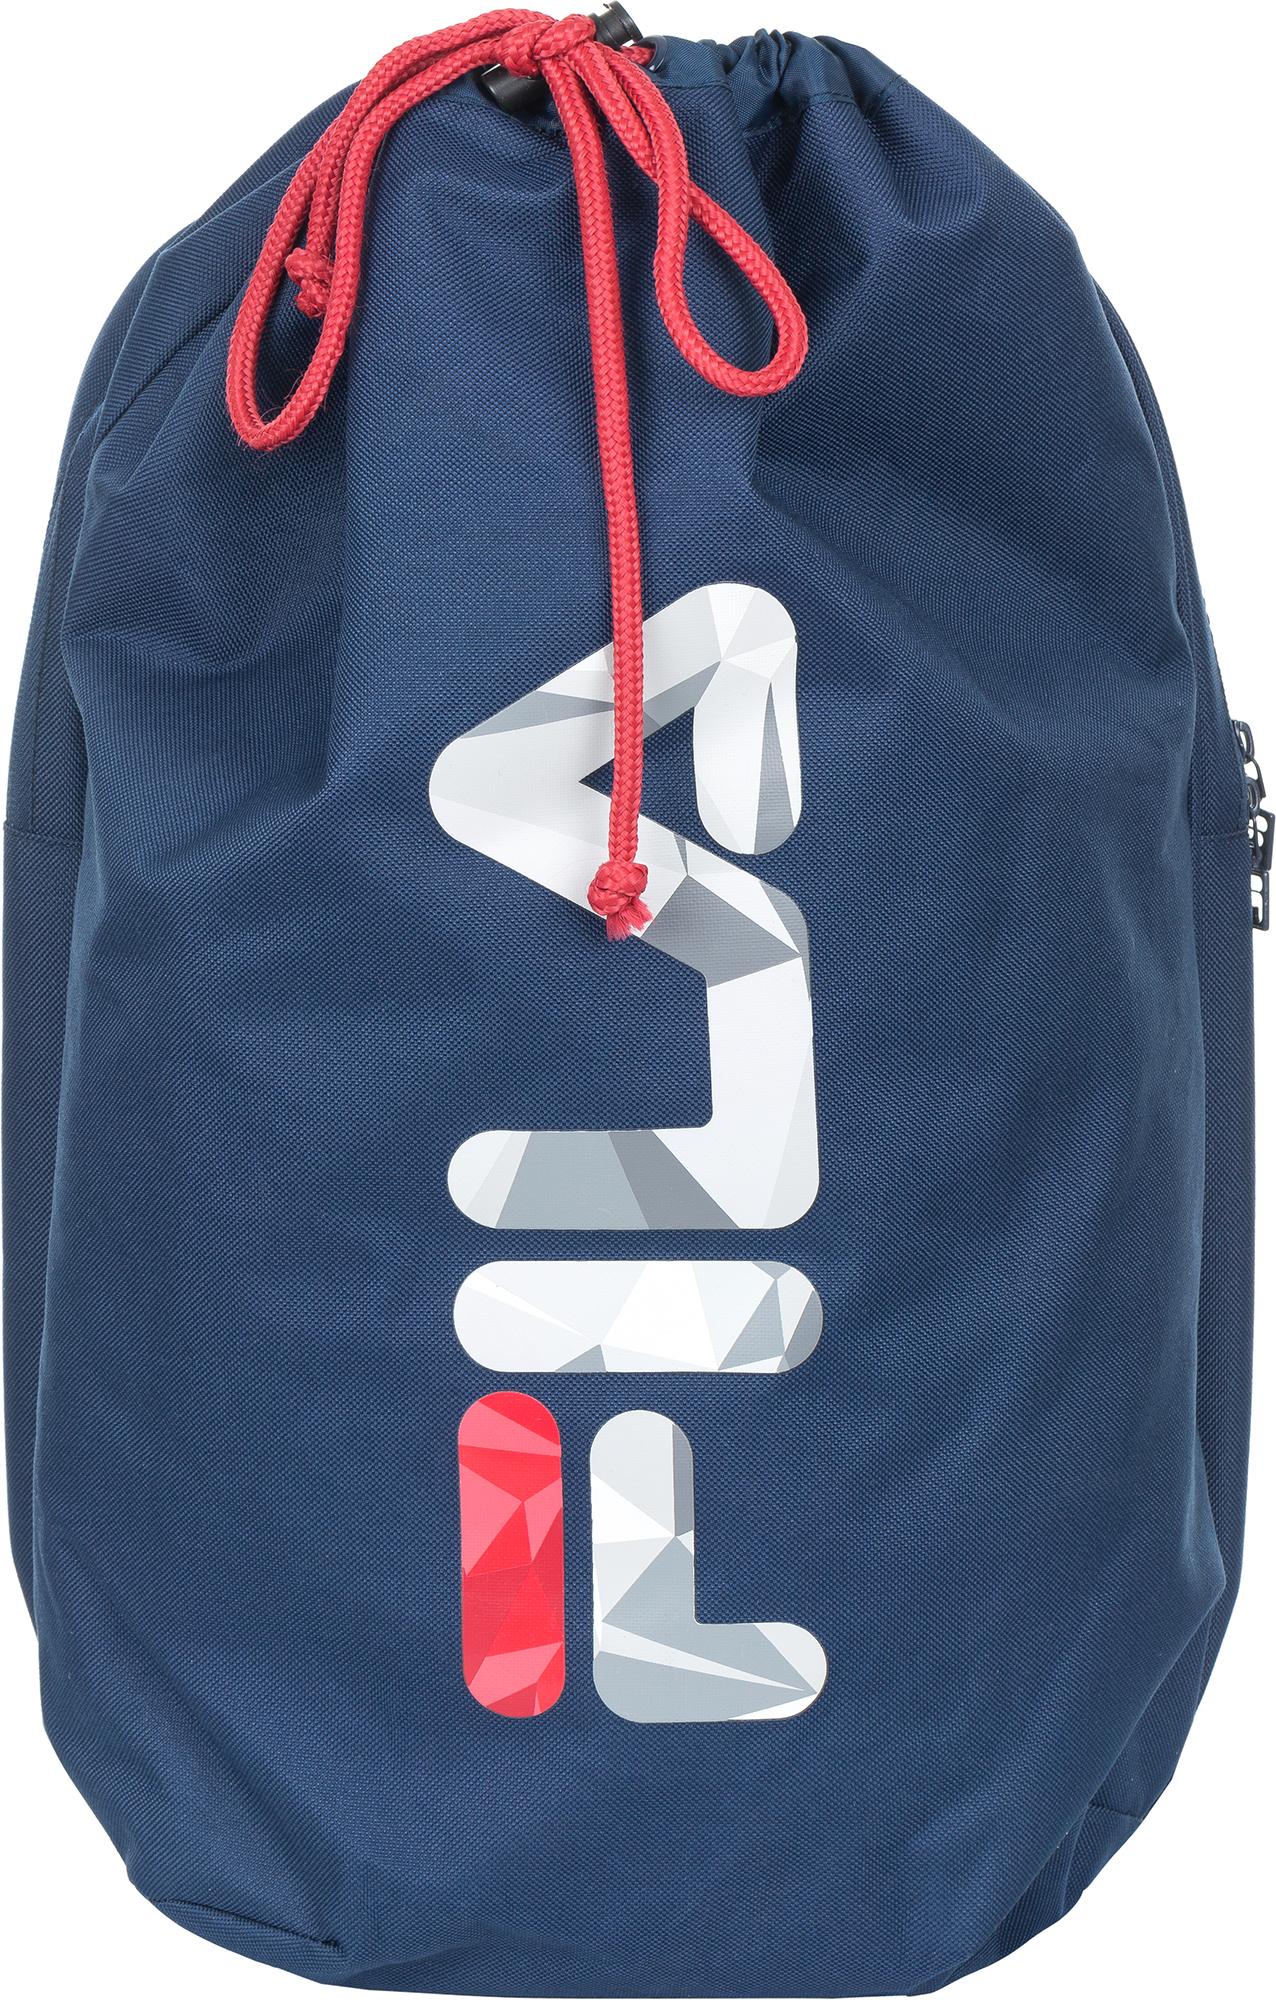 Fila Рюкзак для мальчиков Fila, размер Без размера рюкзак fila f3bpx007 2014